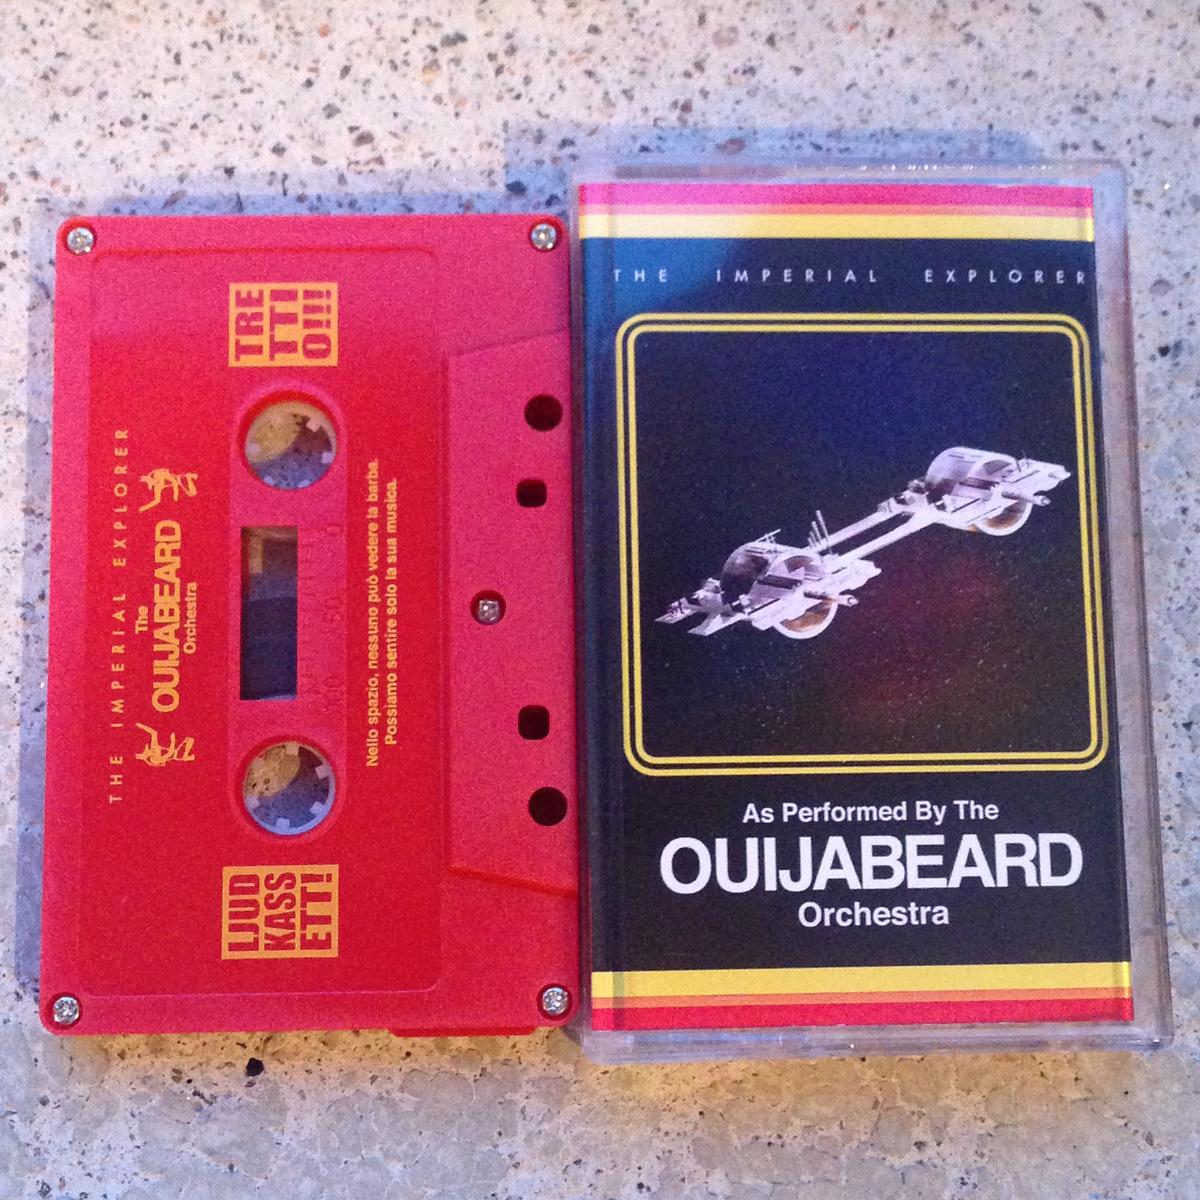 Ouijabeard